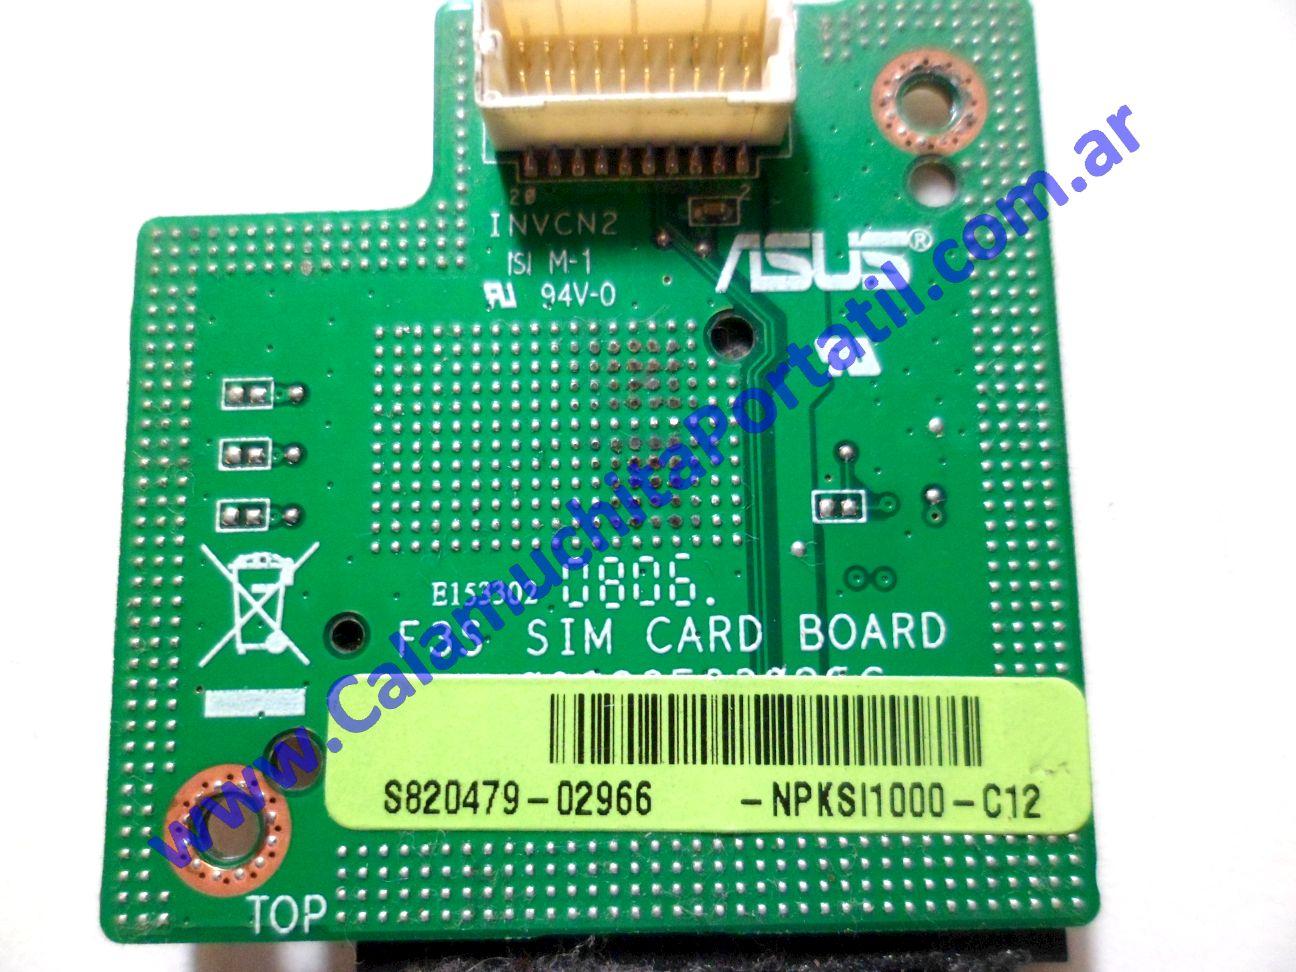 0220PSI Placa Sim Asus X53S / X53SG-AP058C